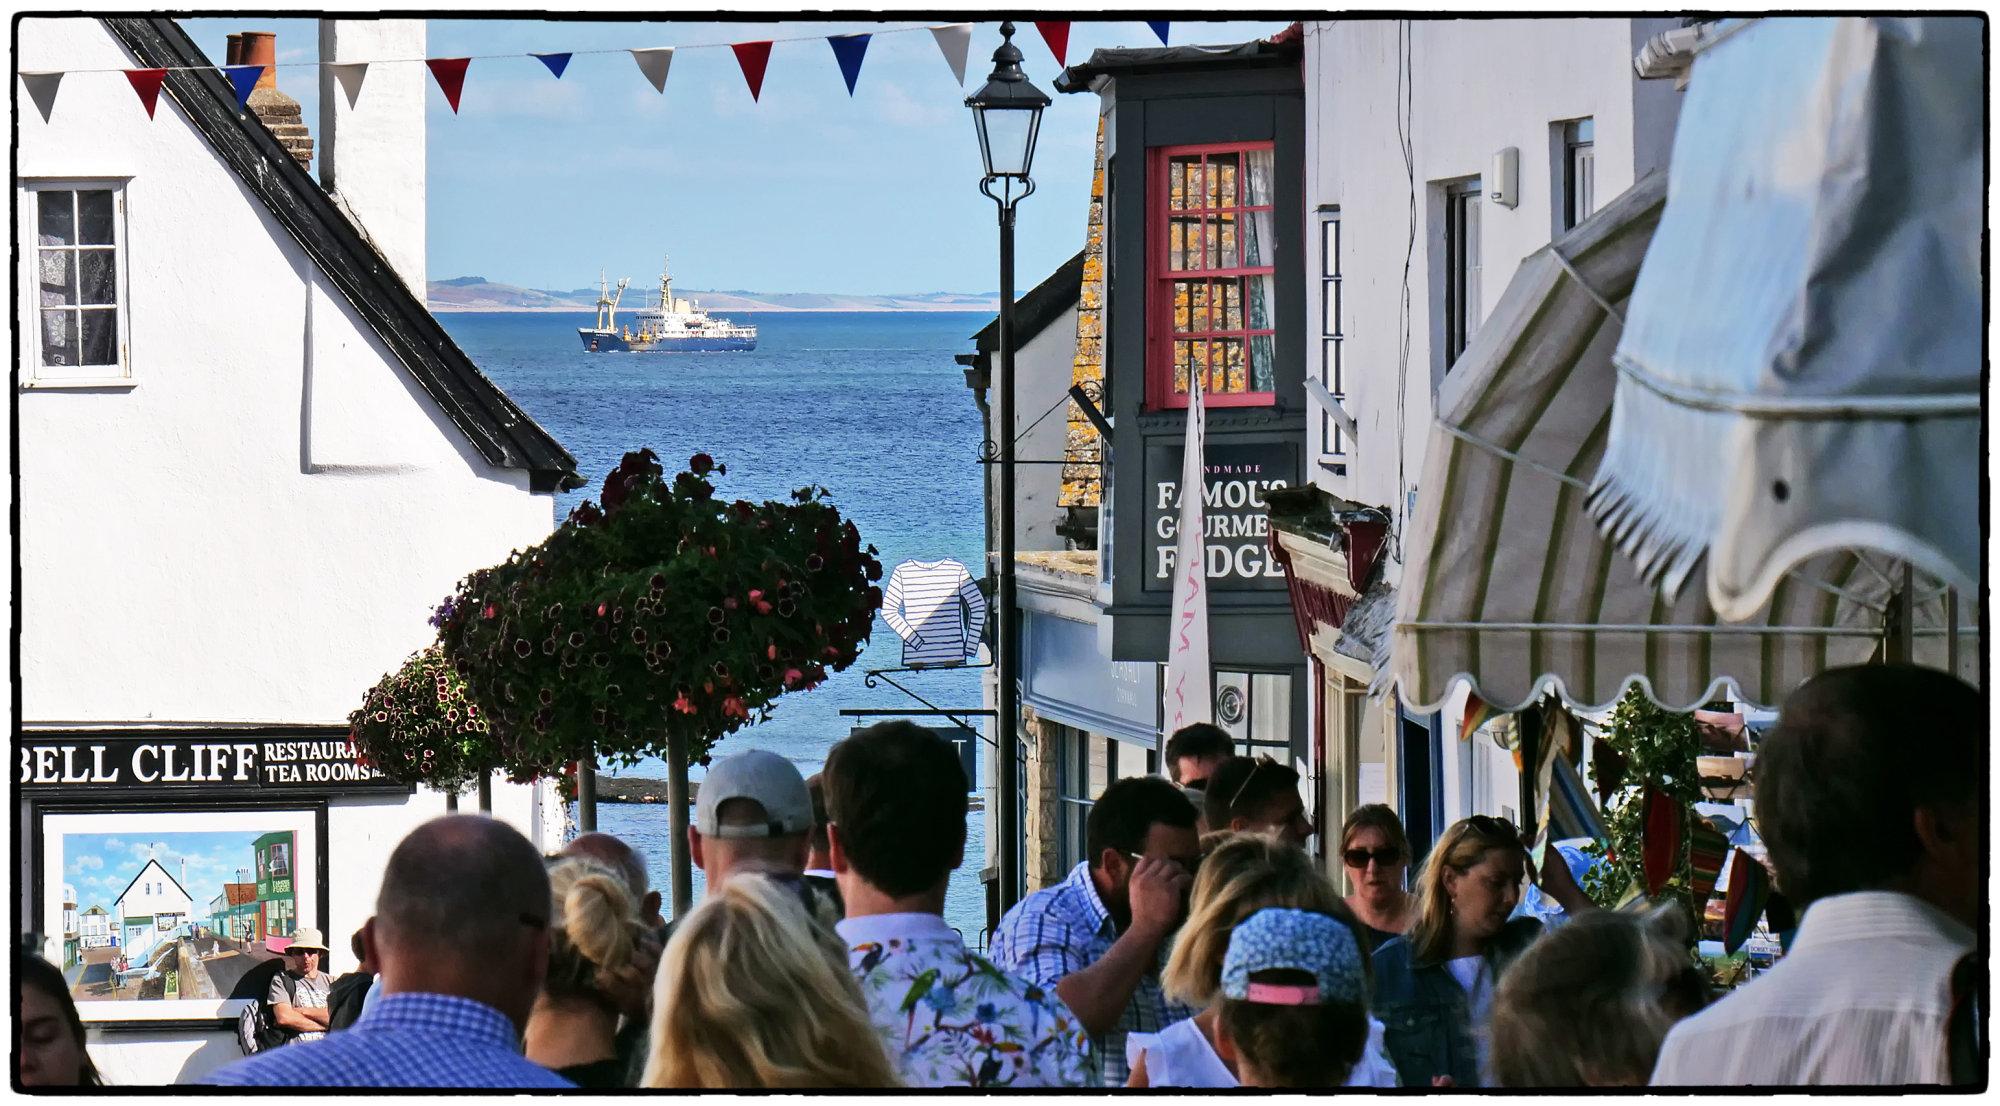 Lyme Regis, Broad Street - Busy Scene